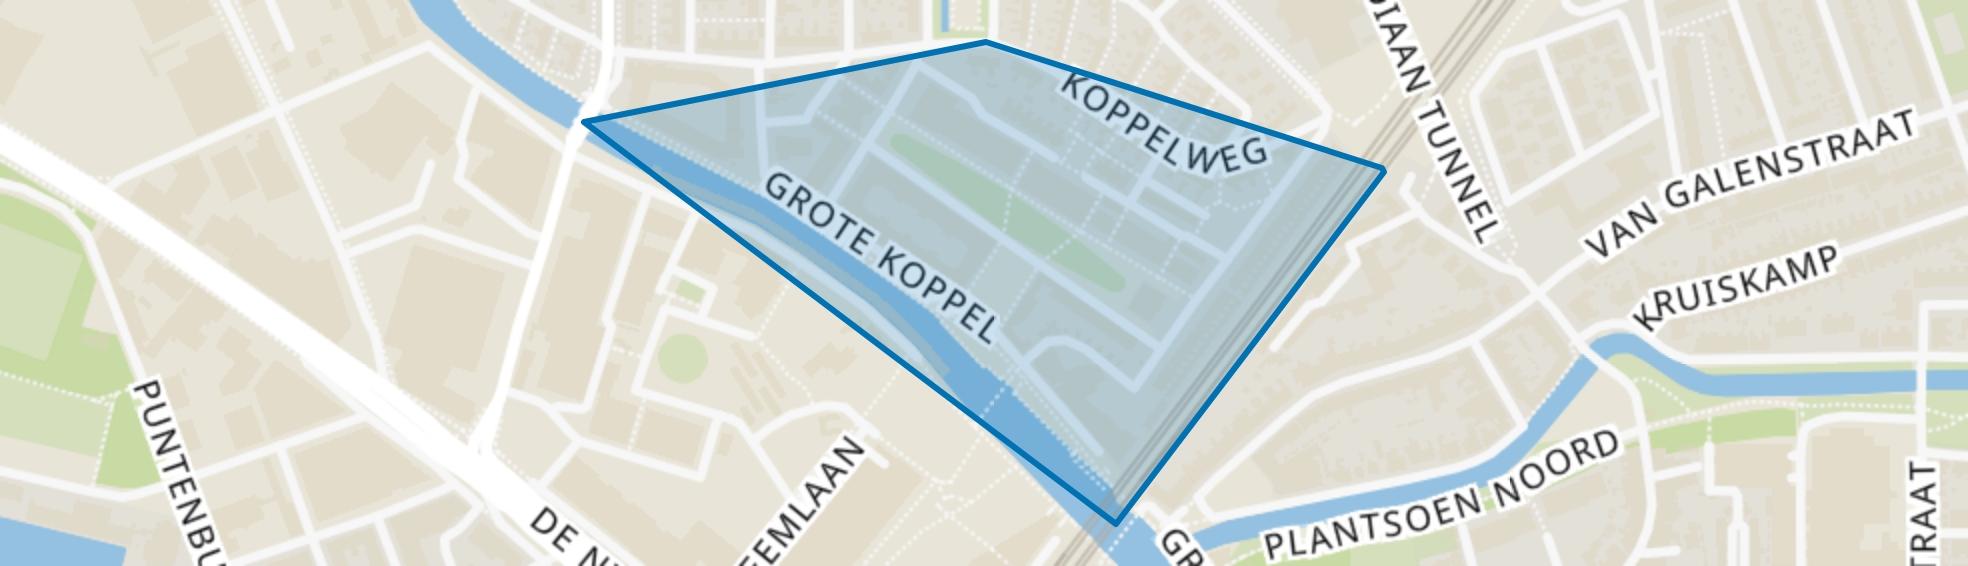 Gildekwartier, Amersfoort map